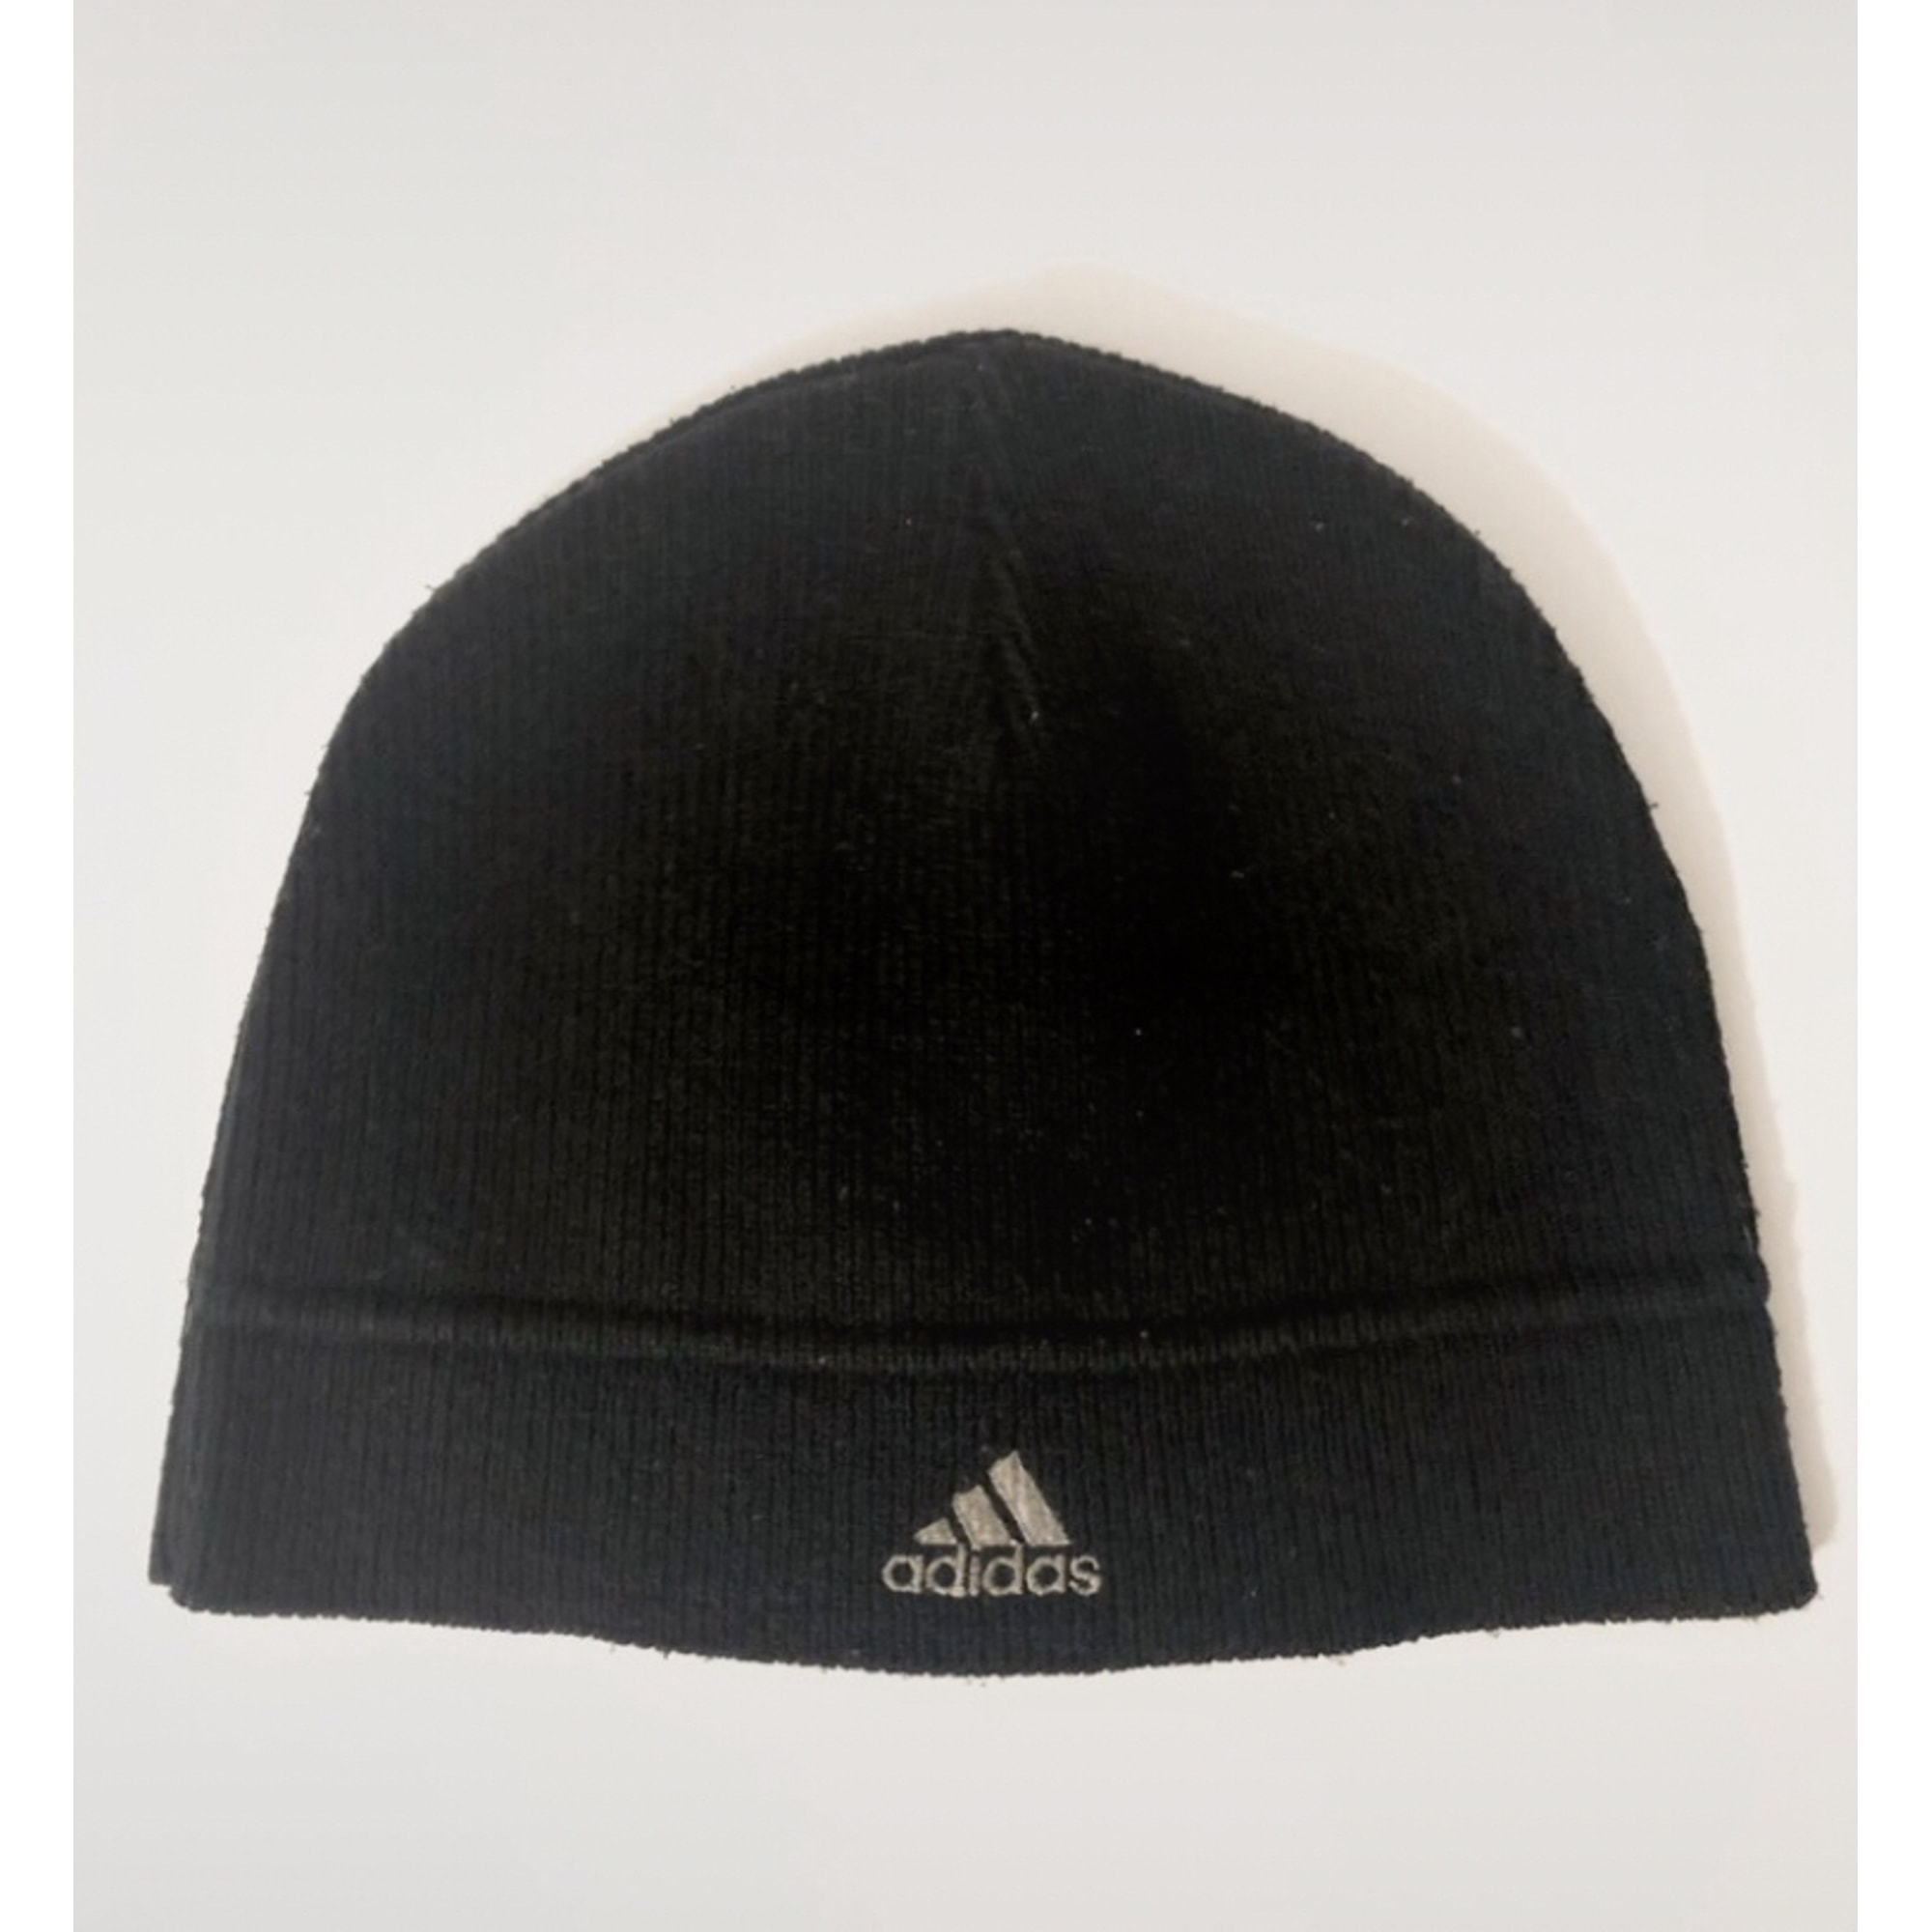 Mütze ADIDAS Schwarz